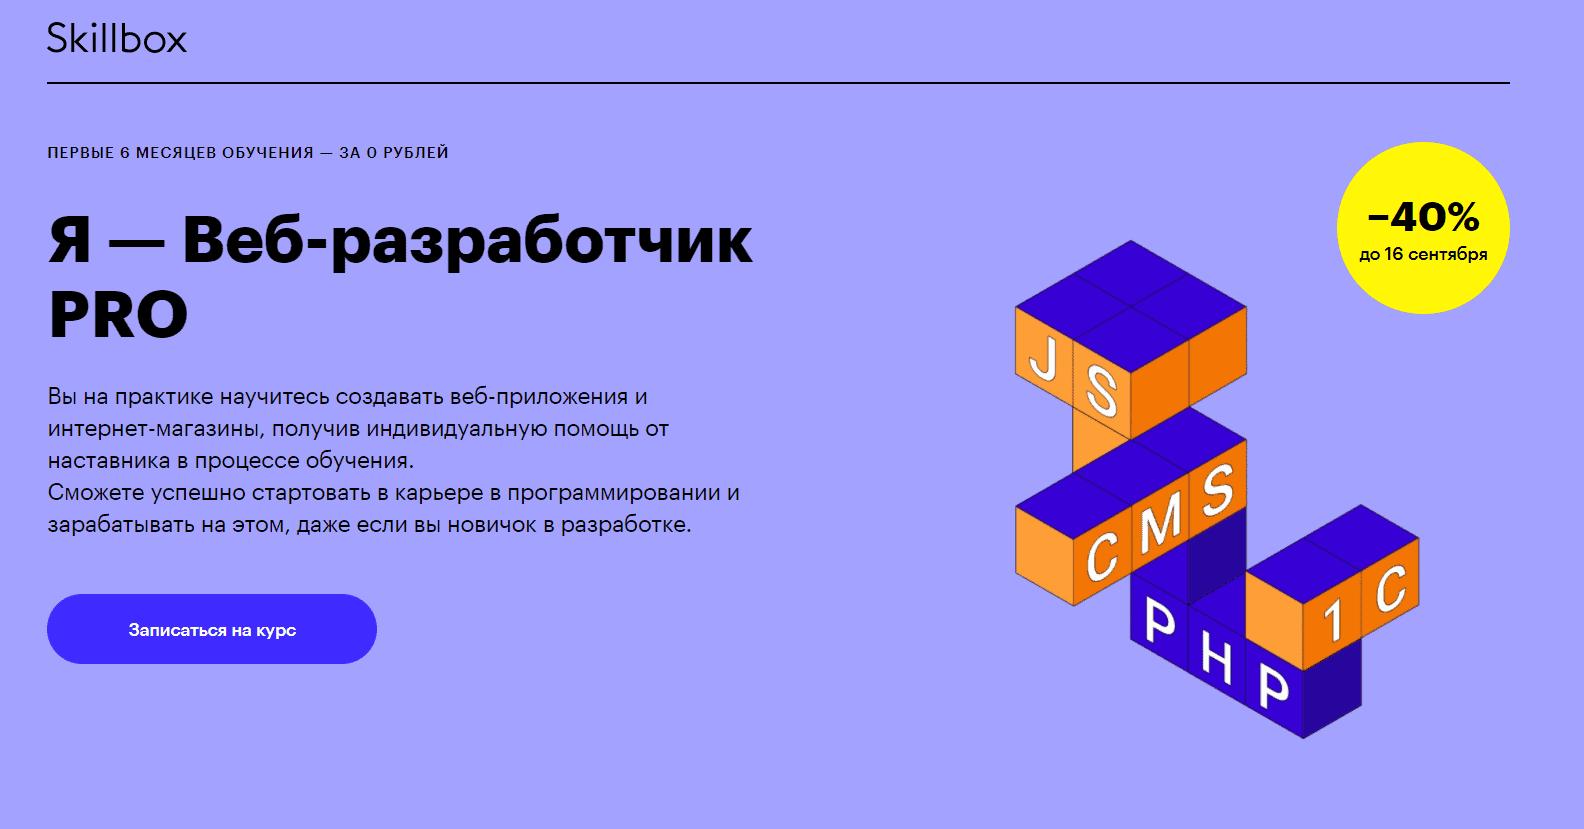 Я — Веб-разработчик PRO Скиллбокс